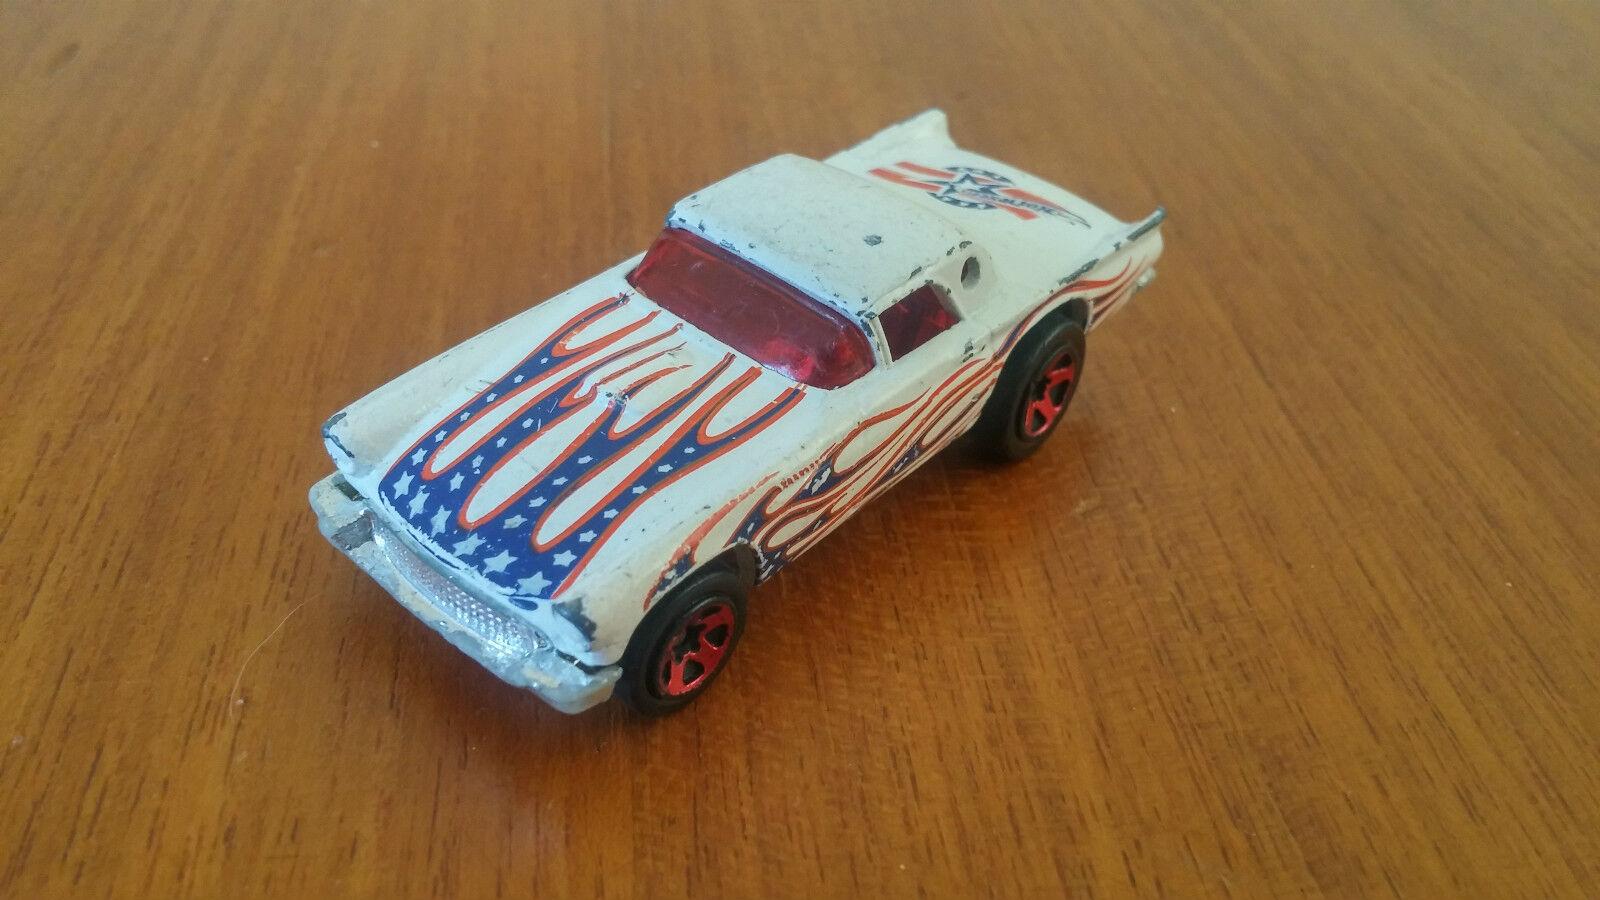 Véhicule Miniature  Hot Wheels    Mattel 1977     Bon Etat